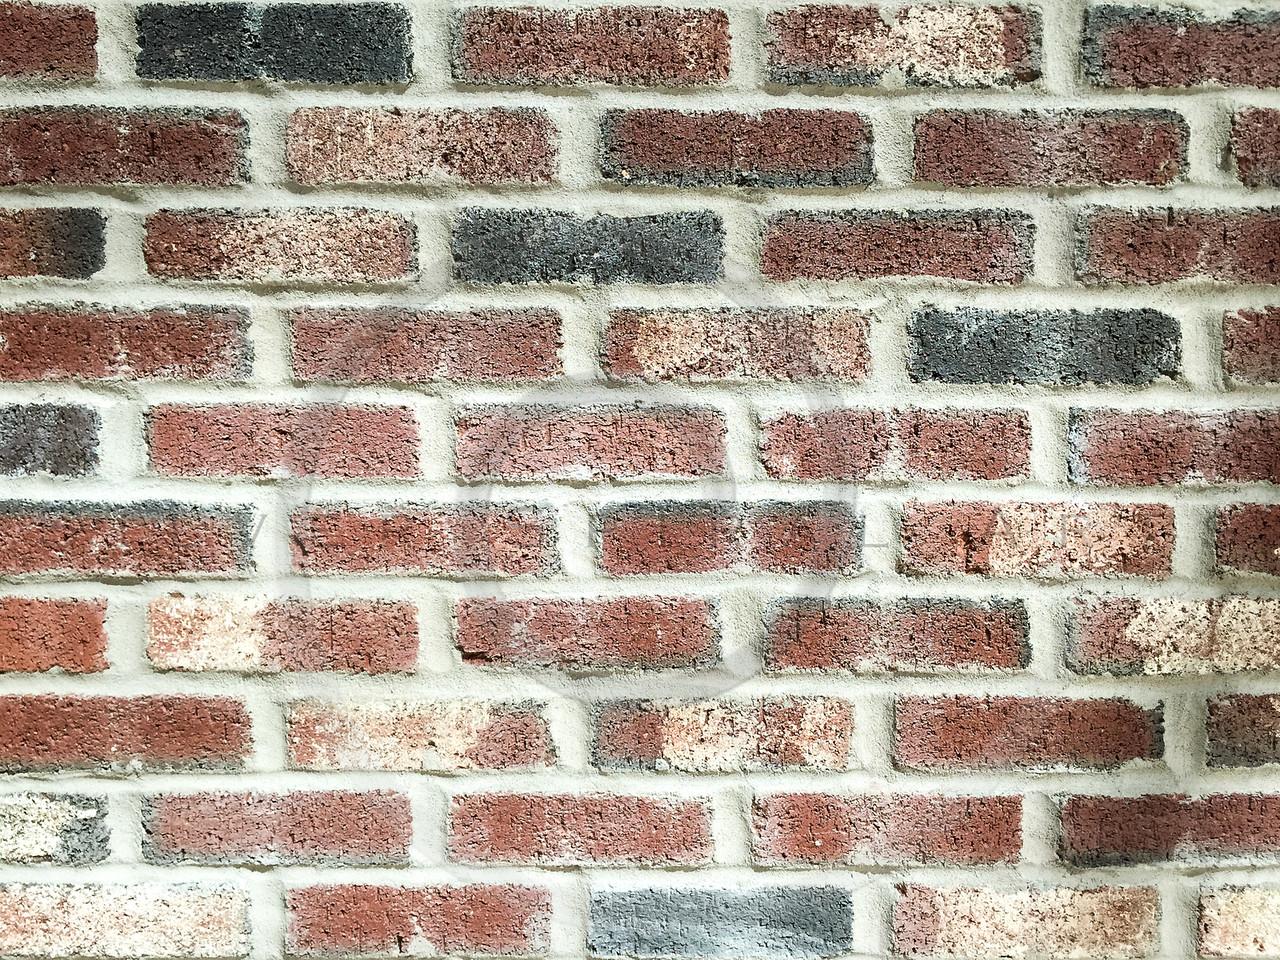 Grey Red Brick Wall Background Texture Gray White Grunge Bricks